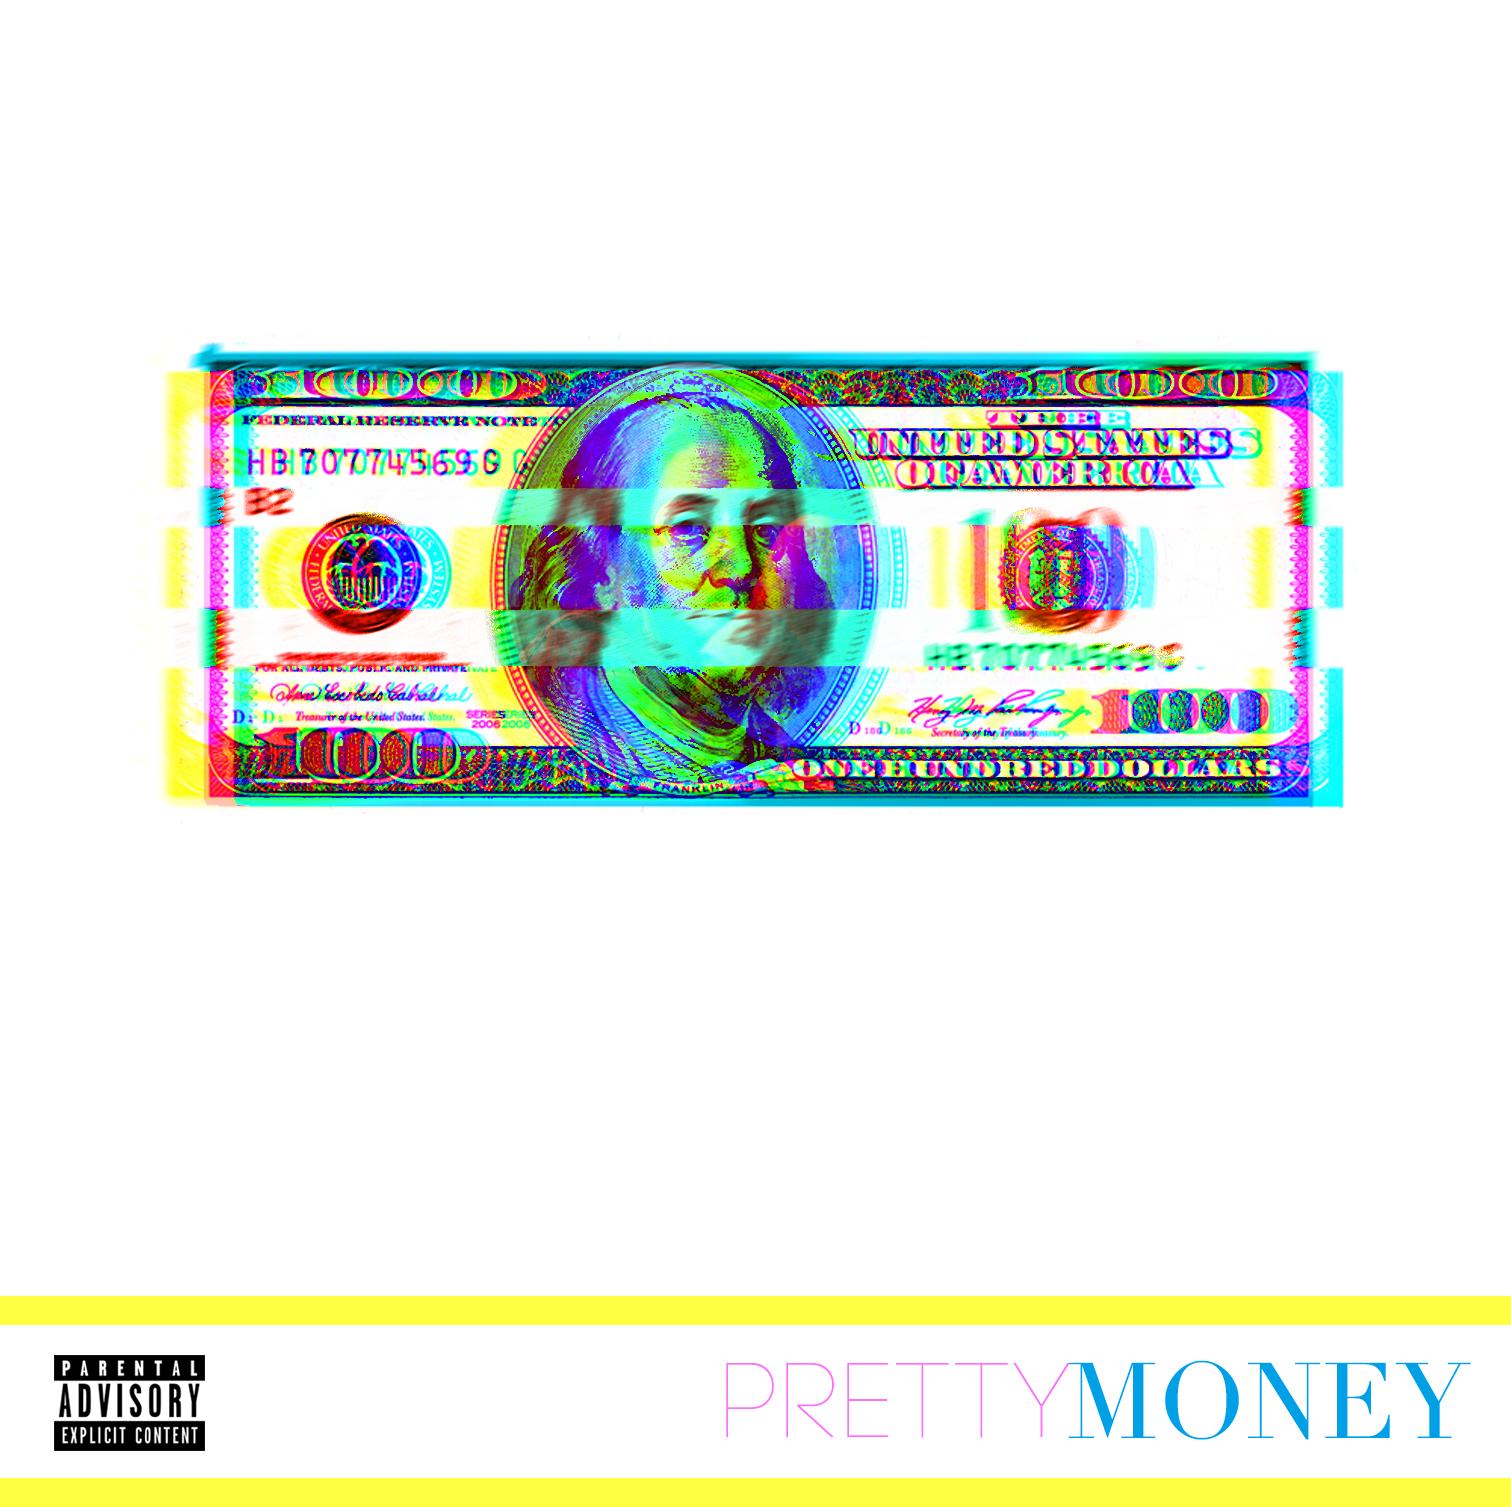 PRETTY-MONEY-ALBUM-CONCEPT4.jpg